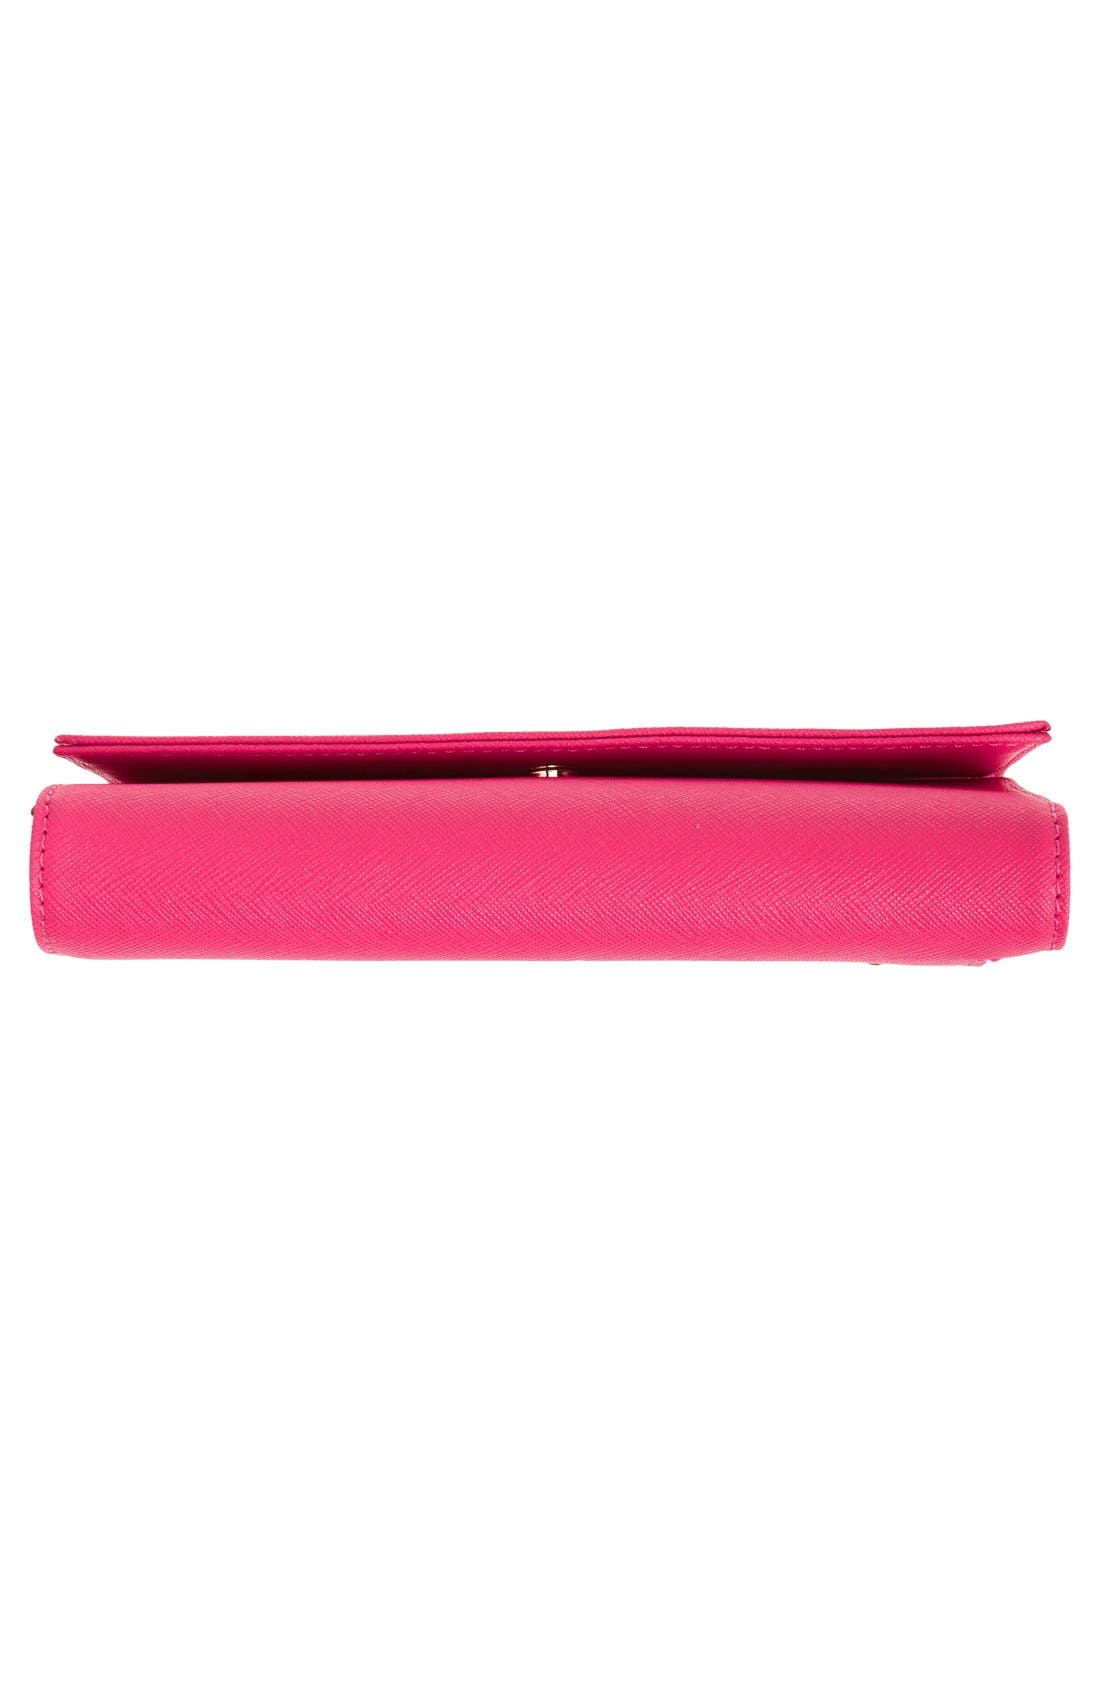 leather iPhone 7/8 & 7/8 Plus case,                             Alternate thumbnail 56, color,